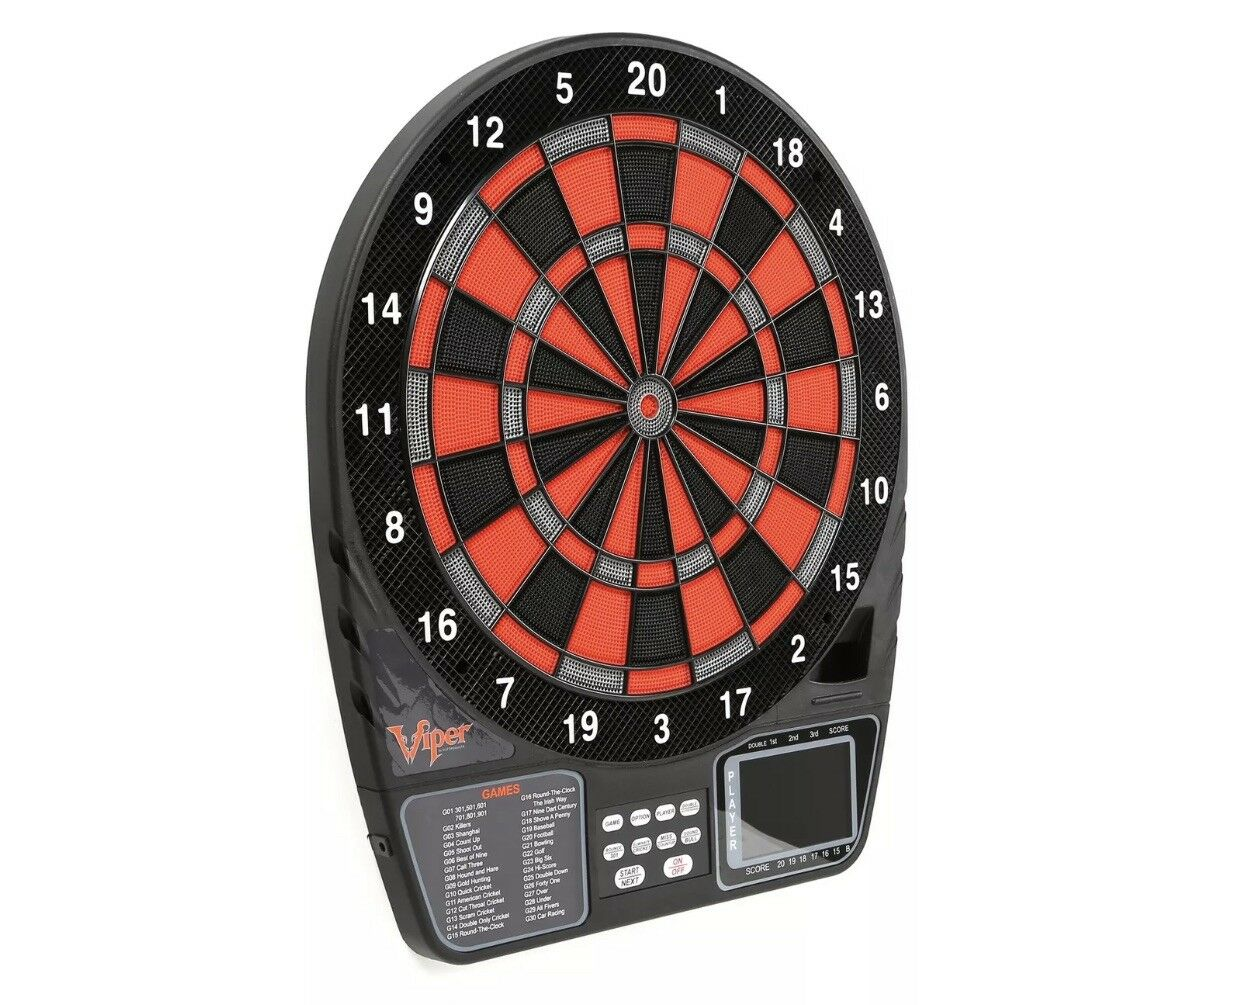 "Viper 797 Electronic Soft Tip Dartboard LCD Darts 15.5"" 1-16 Player Player 1-16 / 43 Games 3b198a"